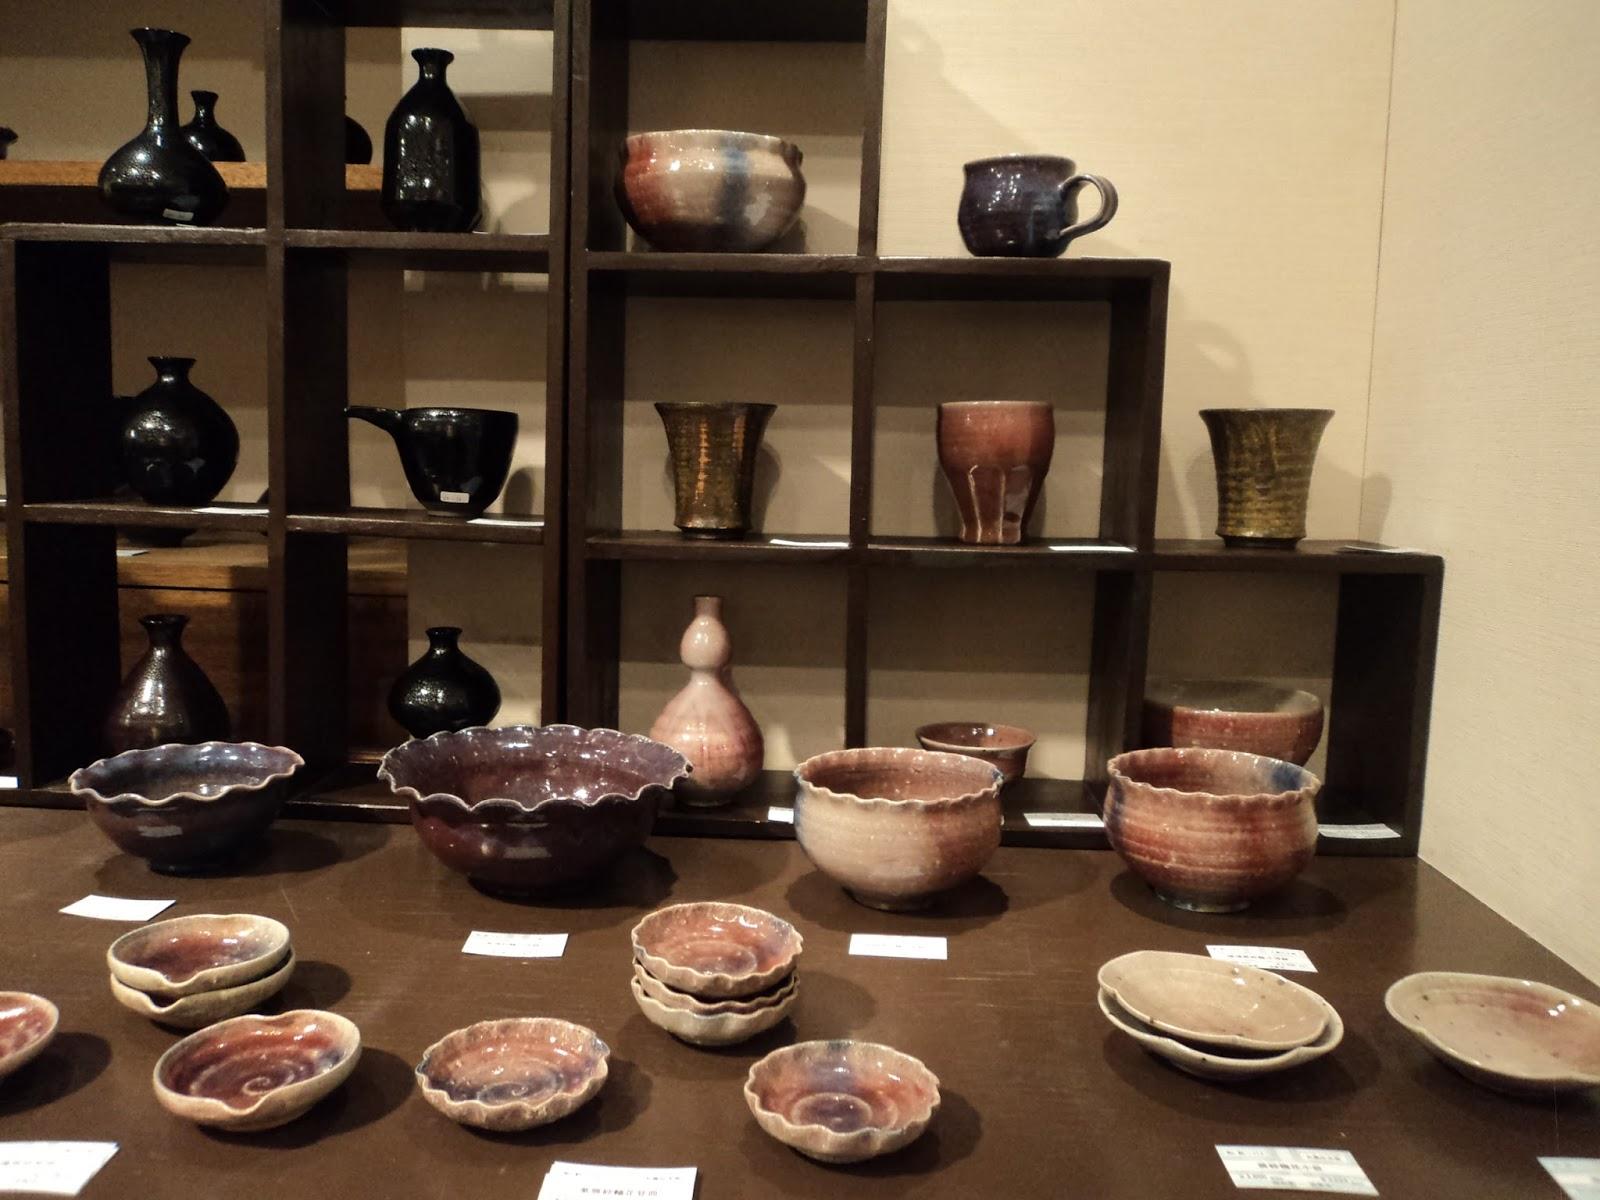 Viviana asiya cer mica julio 2015 for Ceramica buenos aires